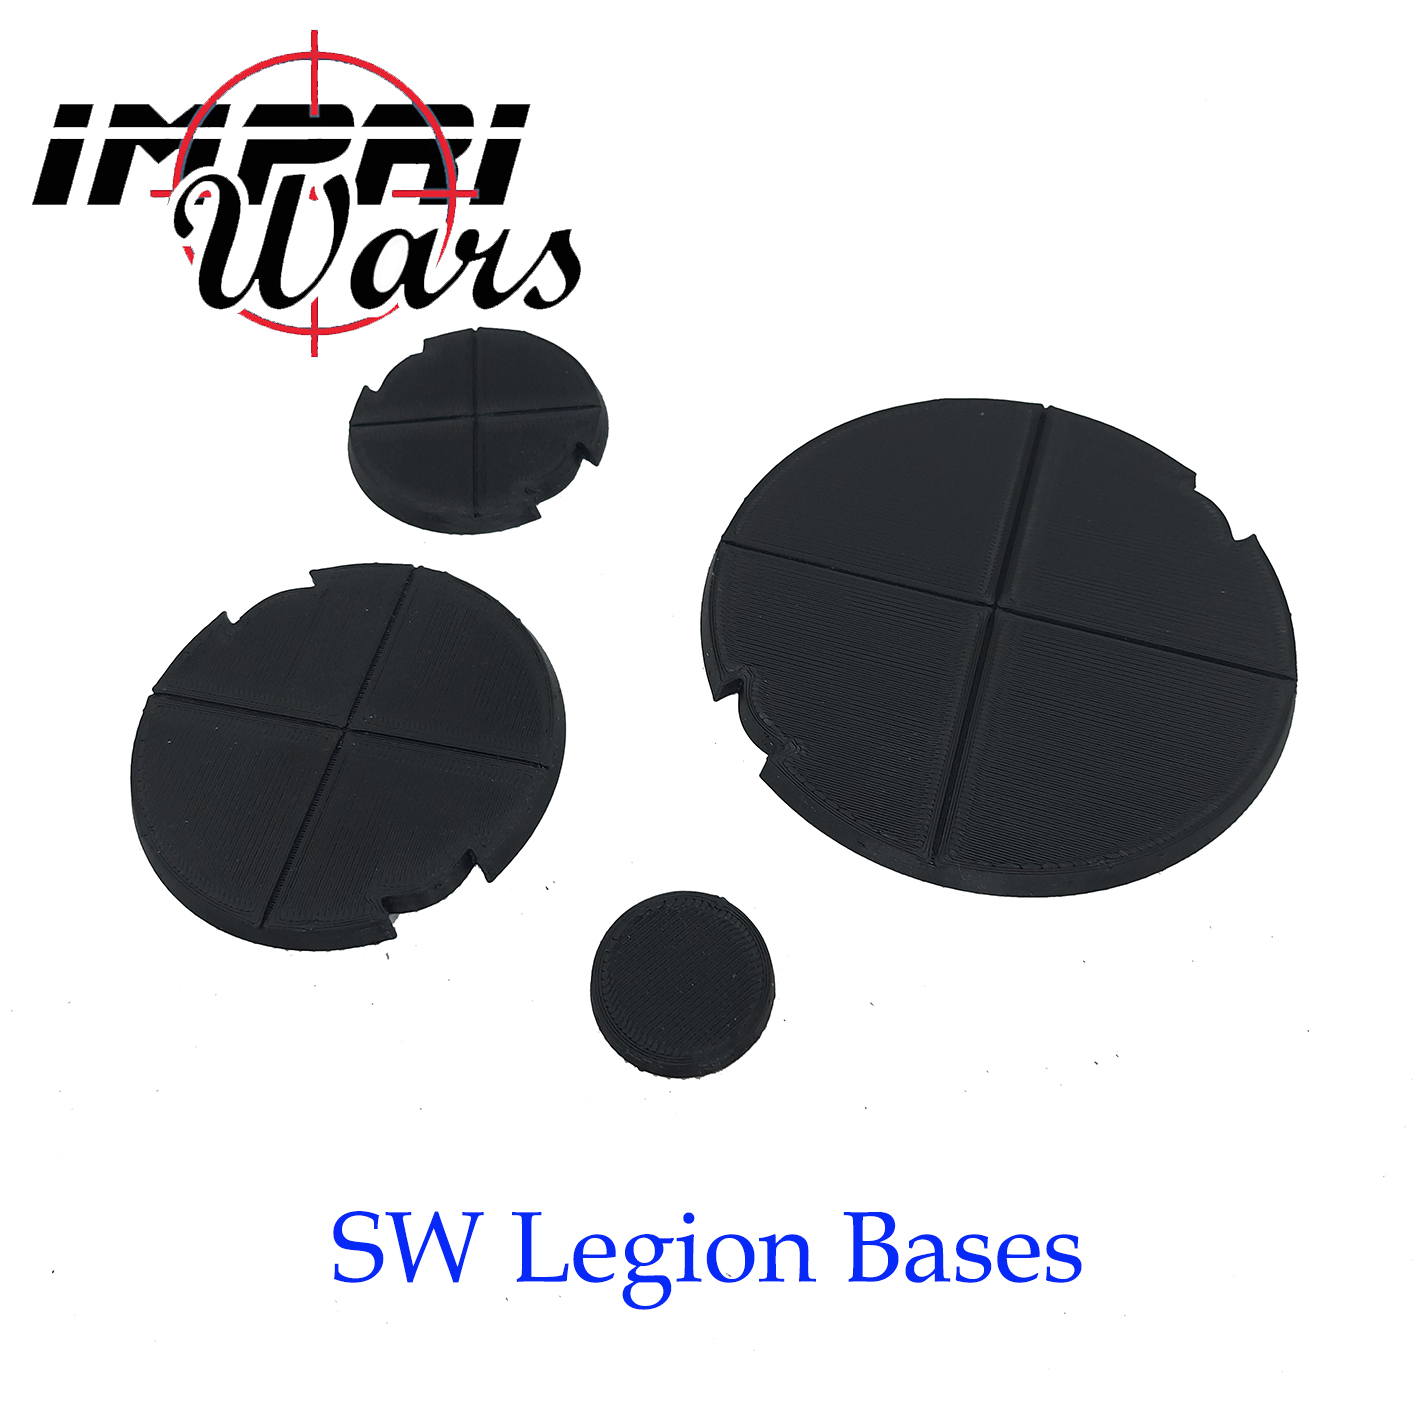 impriwars_sw